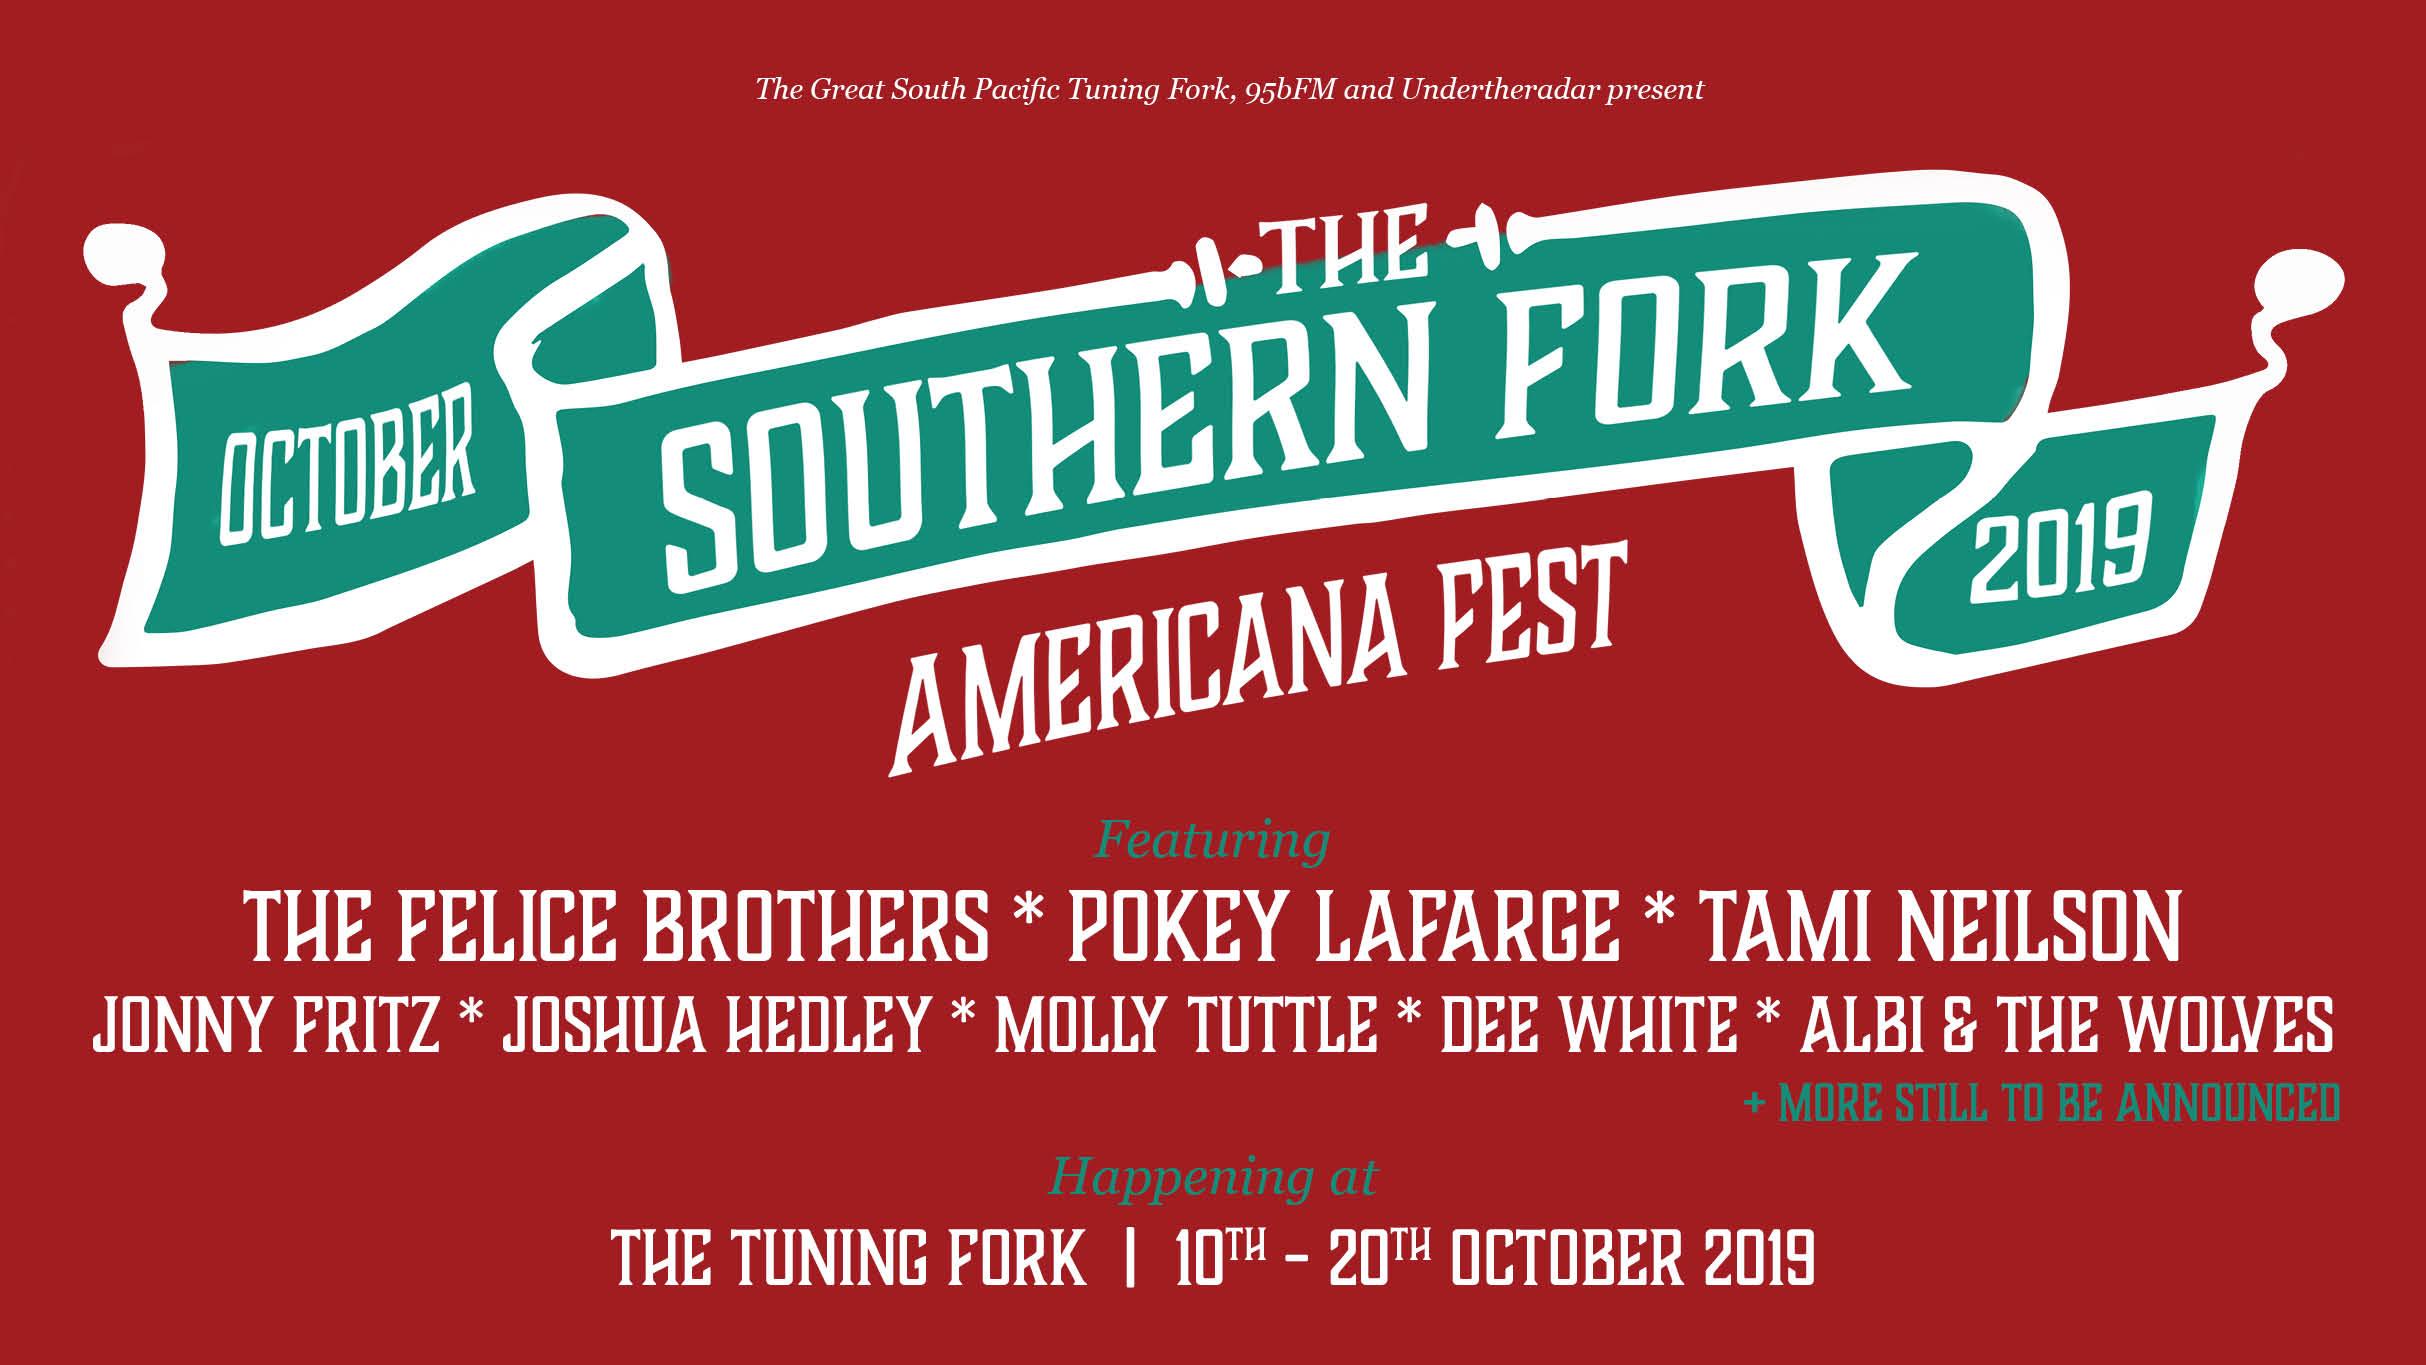 Southern Fork Americana Fest: Pokey Lafarge